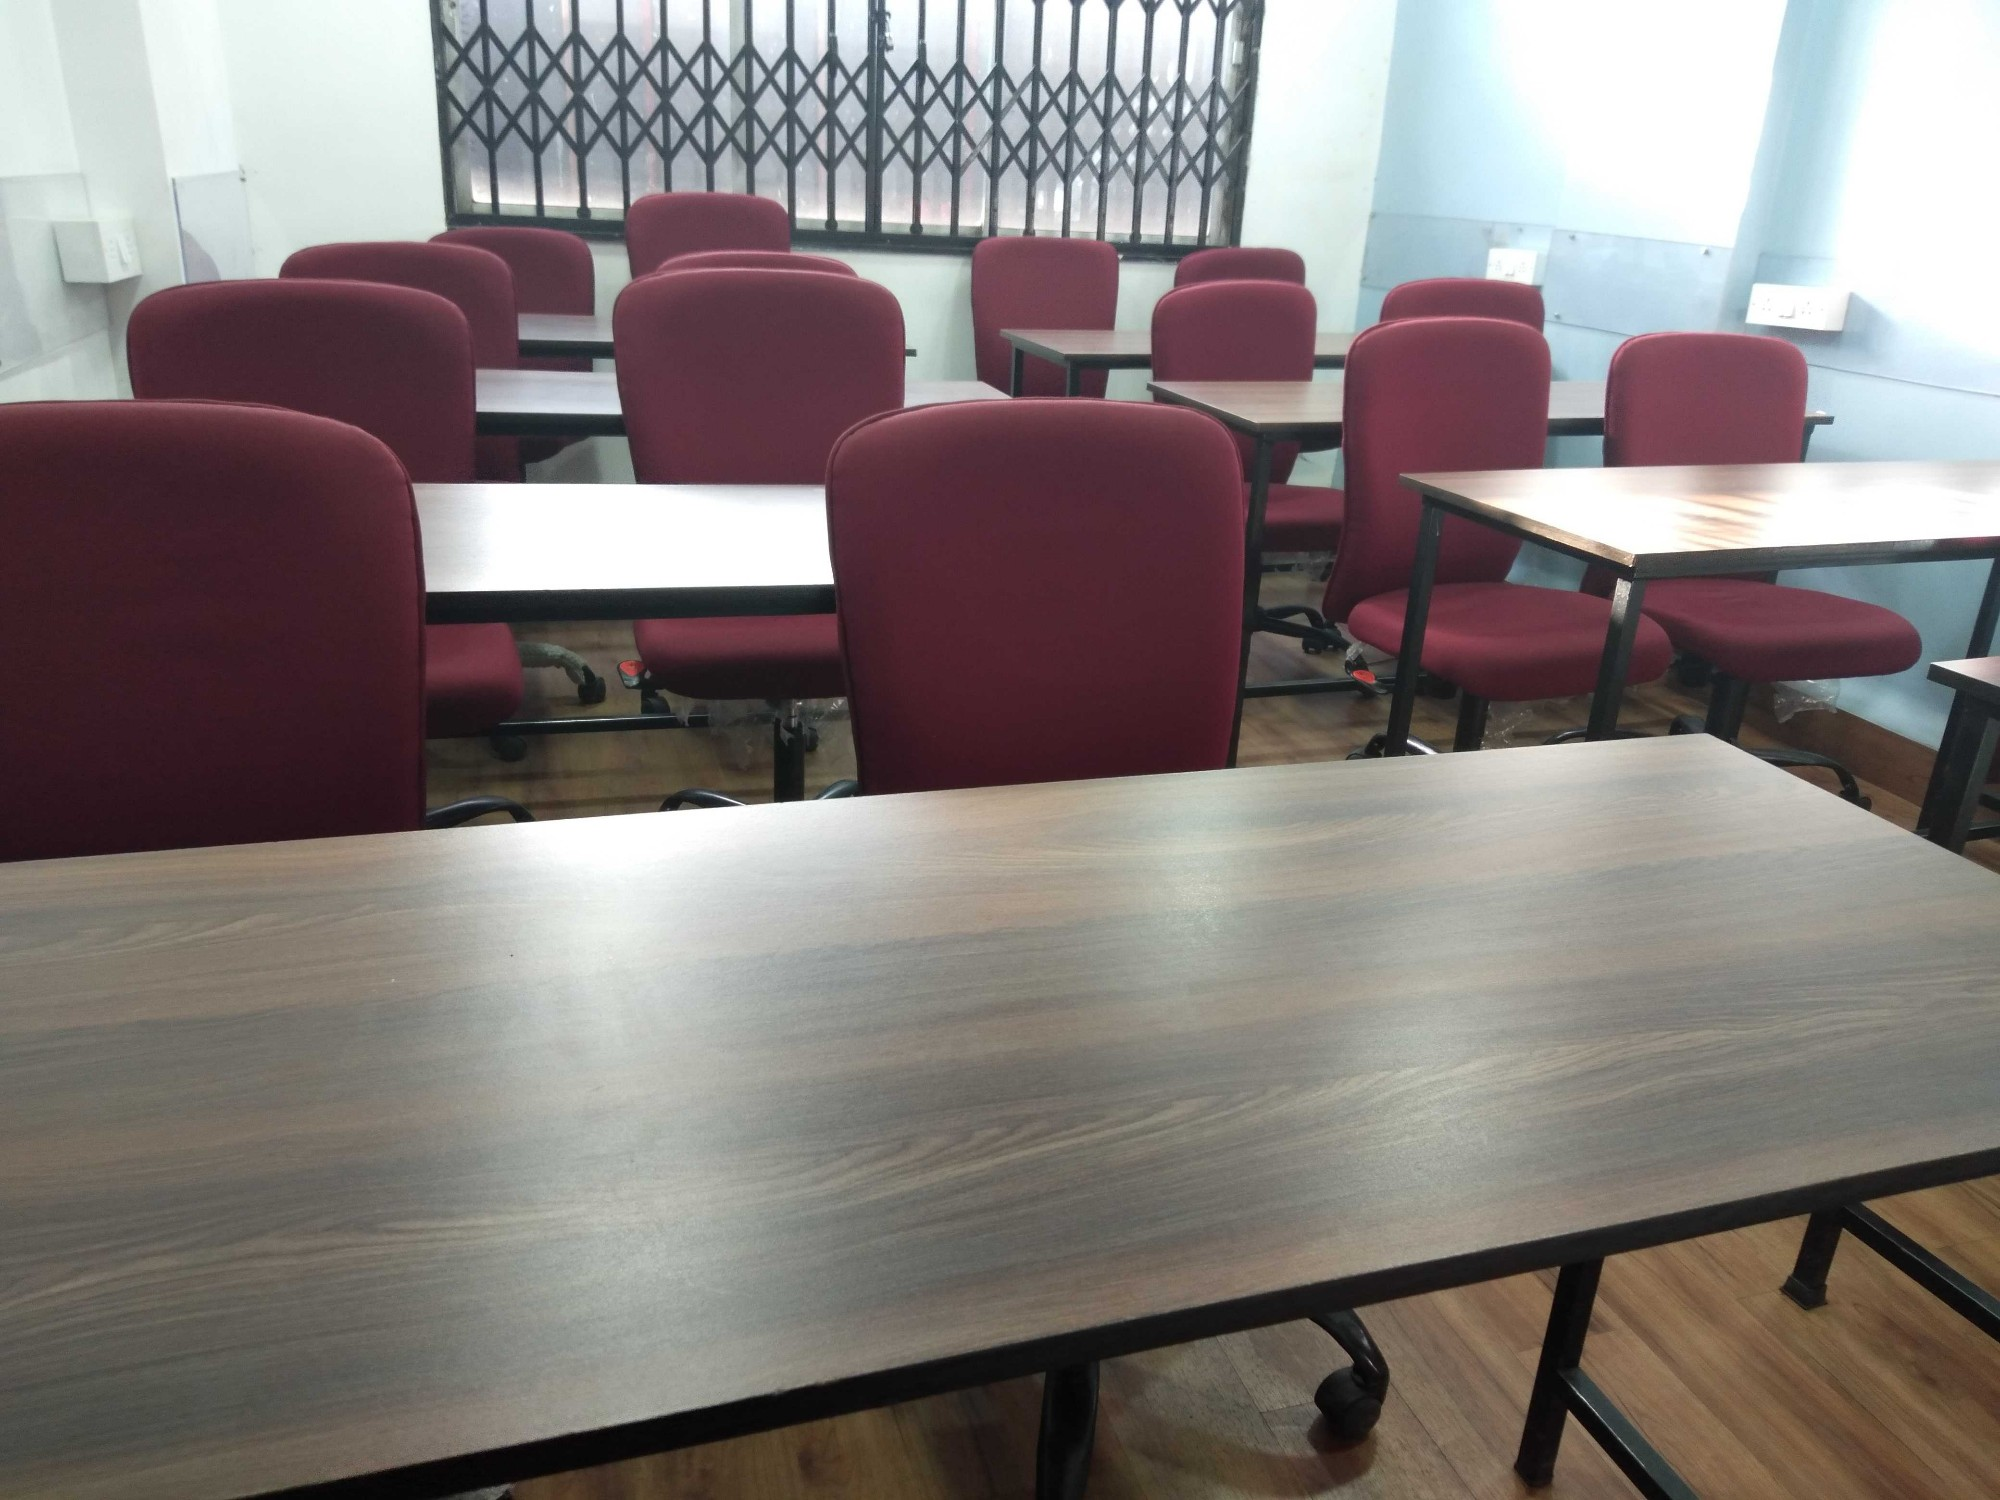 Top 10 Digital Marketing Courses in Vikhroli West, Mumbai, Course